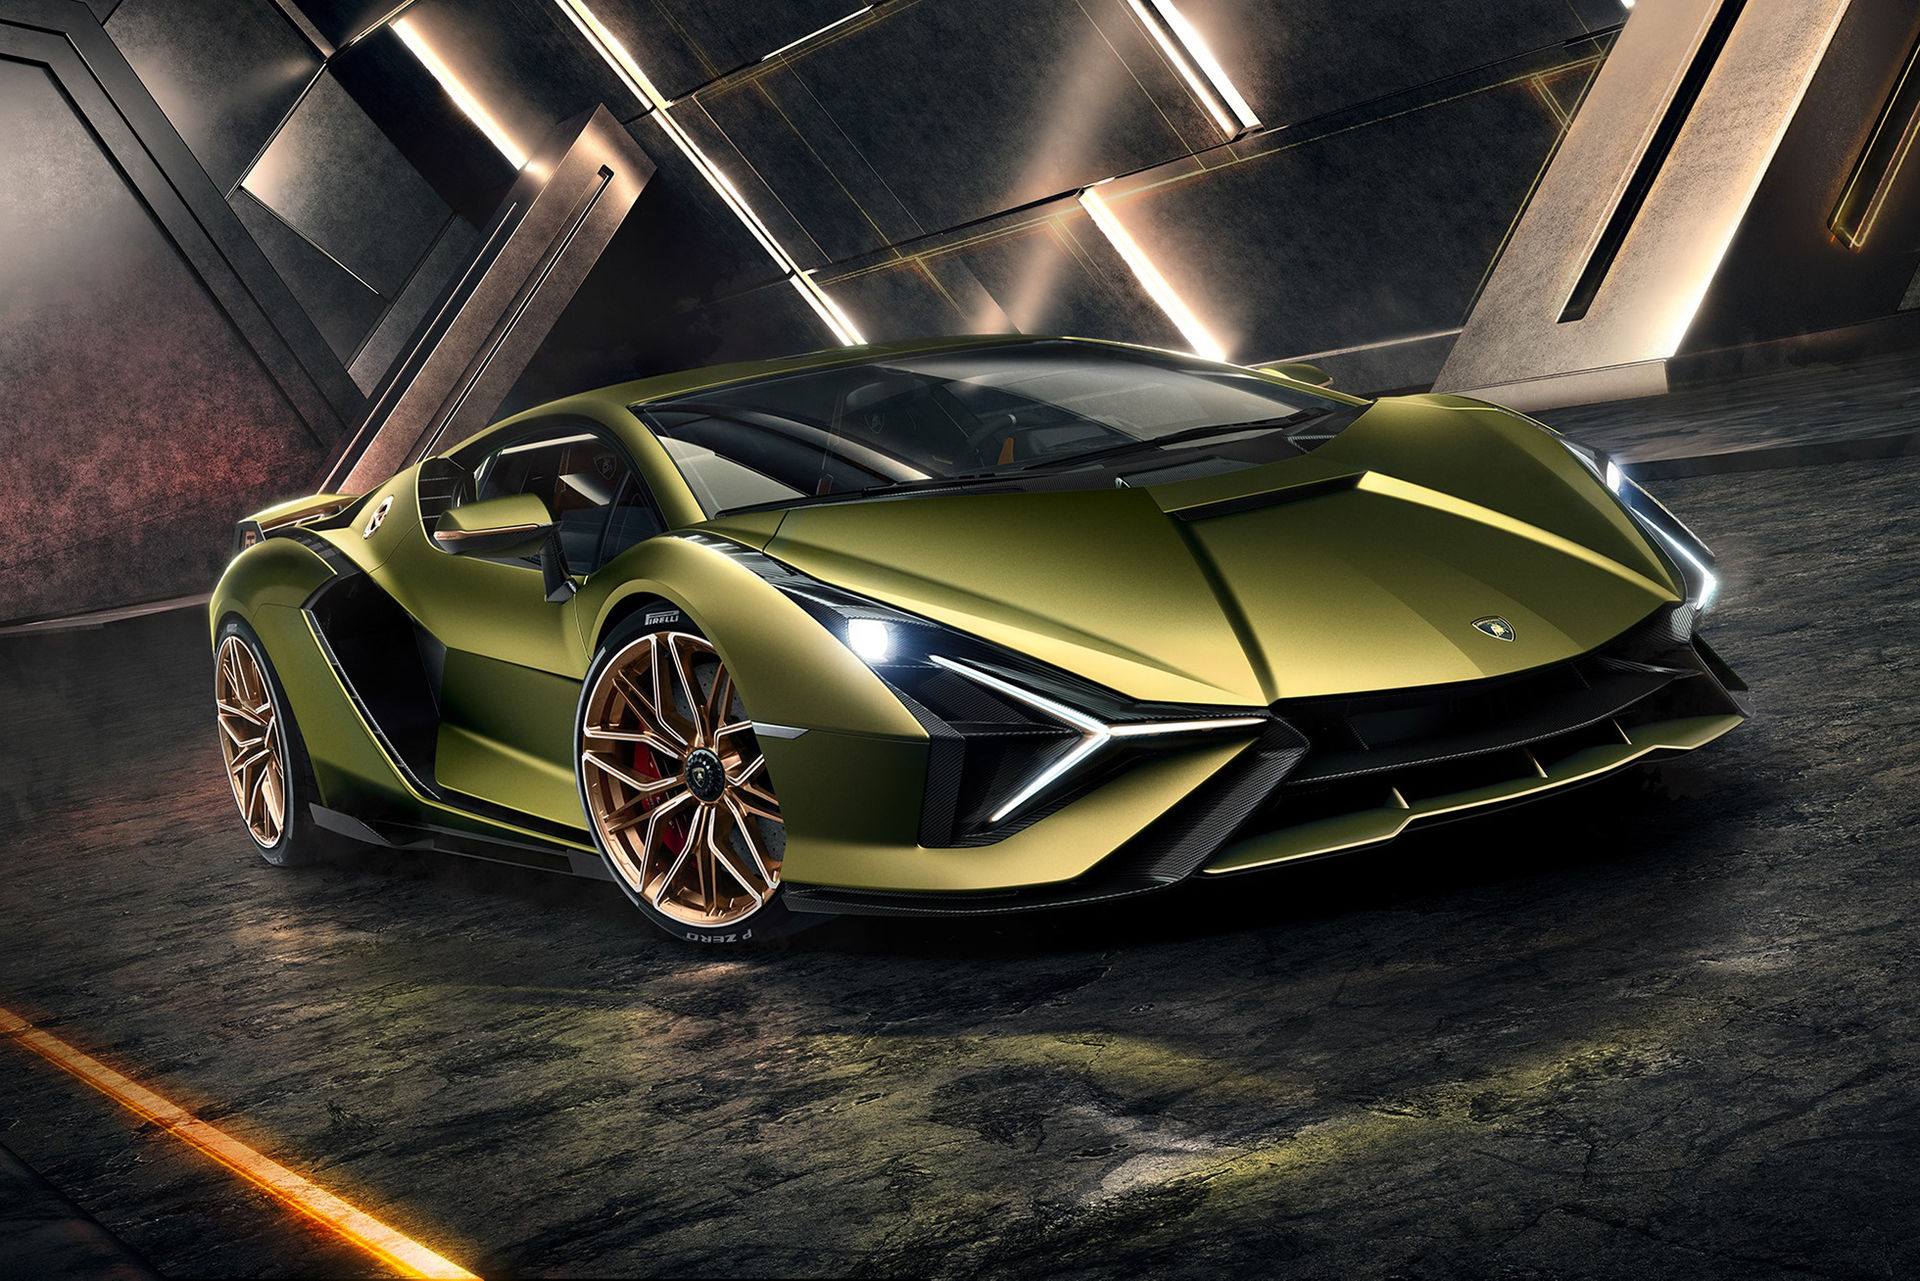 Lamborghini presenterar sin första hybrid - Sián